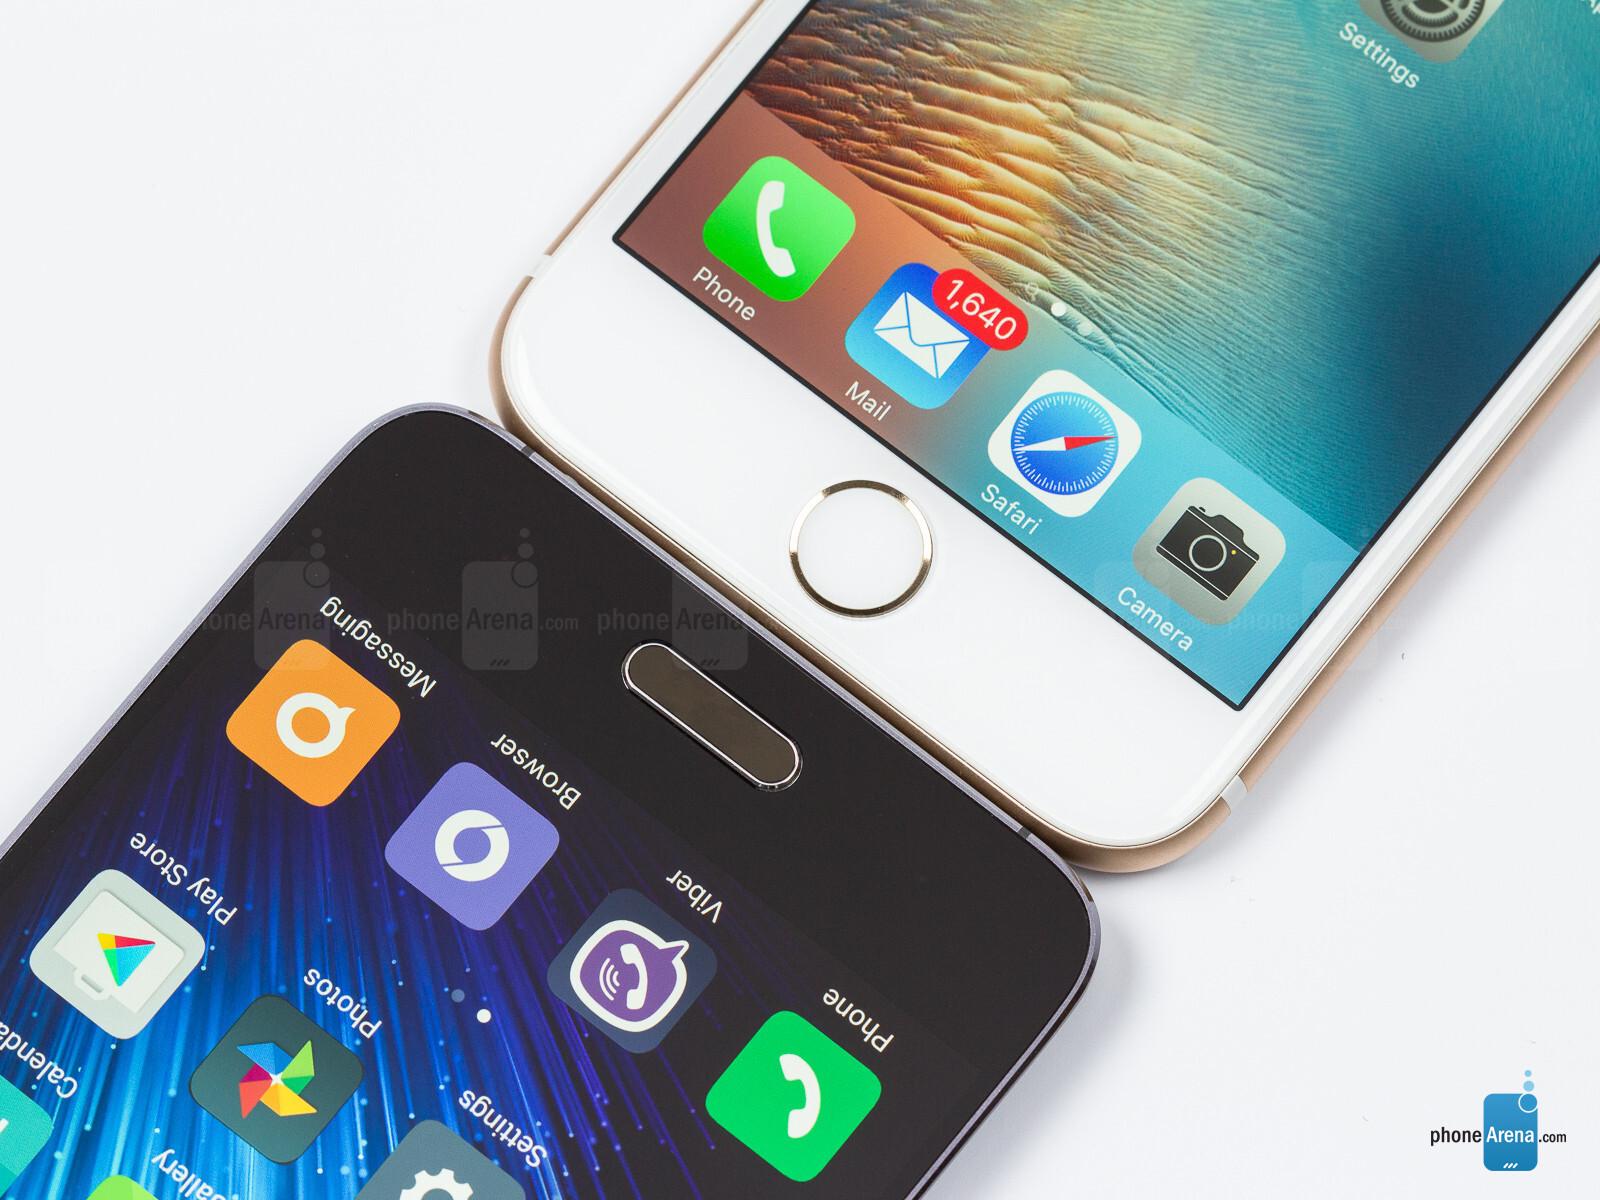 aab29aa07ab Xiaomi Mi 5 vs Apple iPhone 6s - PhoneArena